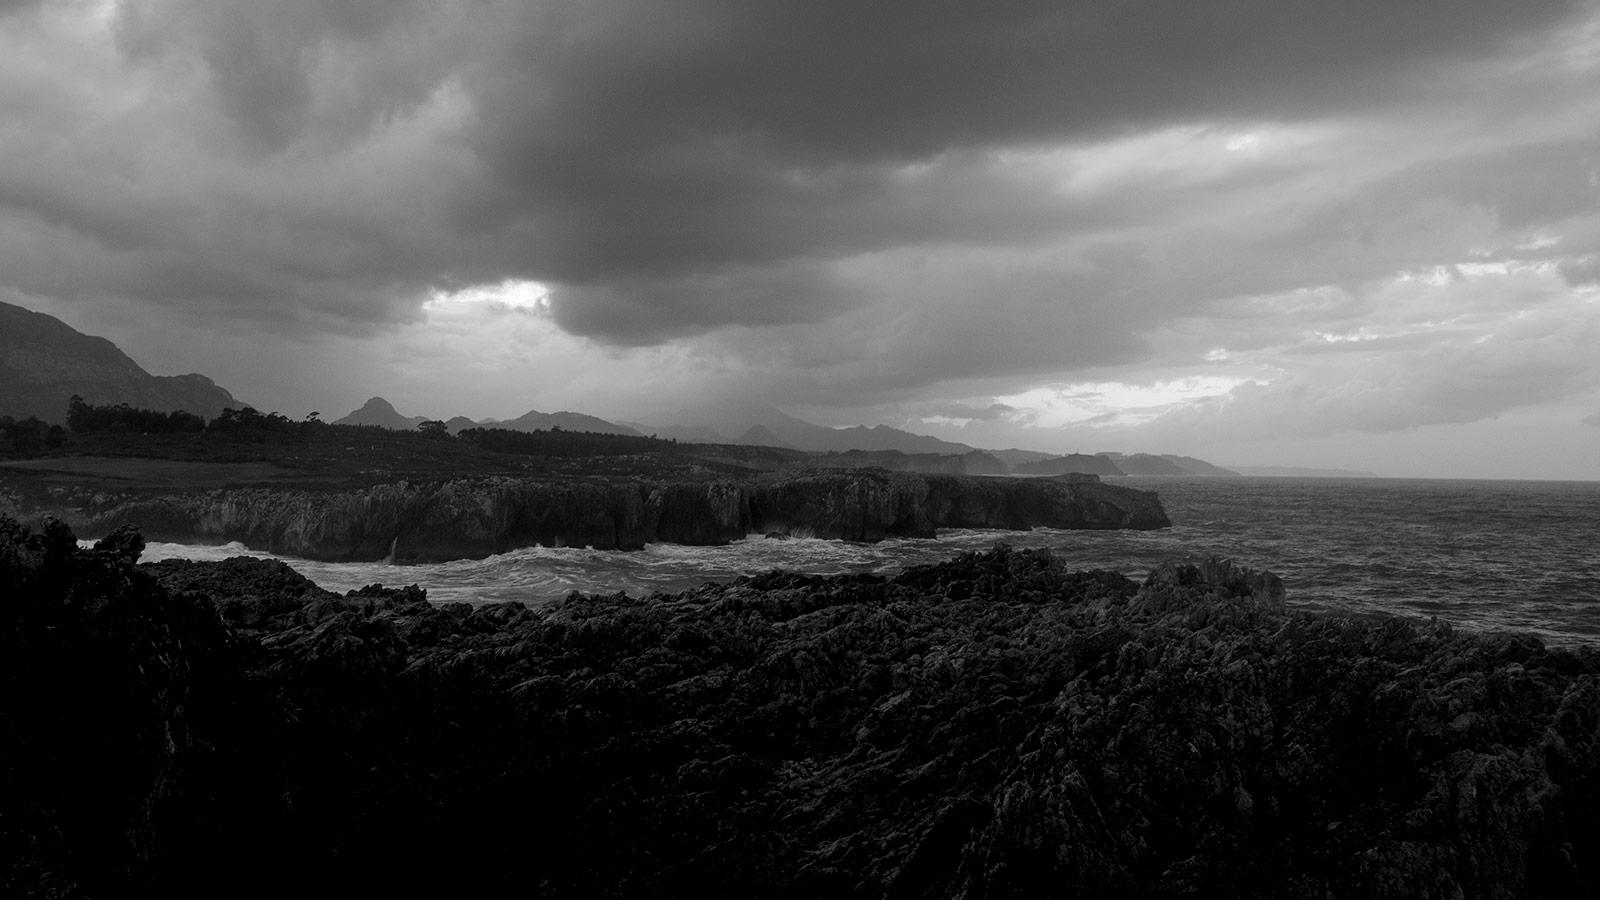 Ocean storm cliff asturias photographer